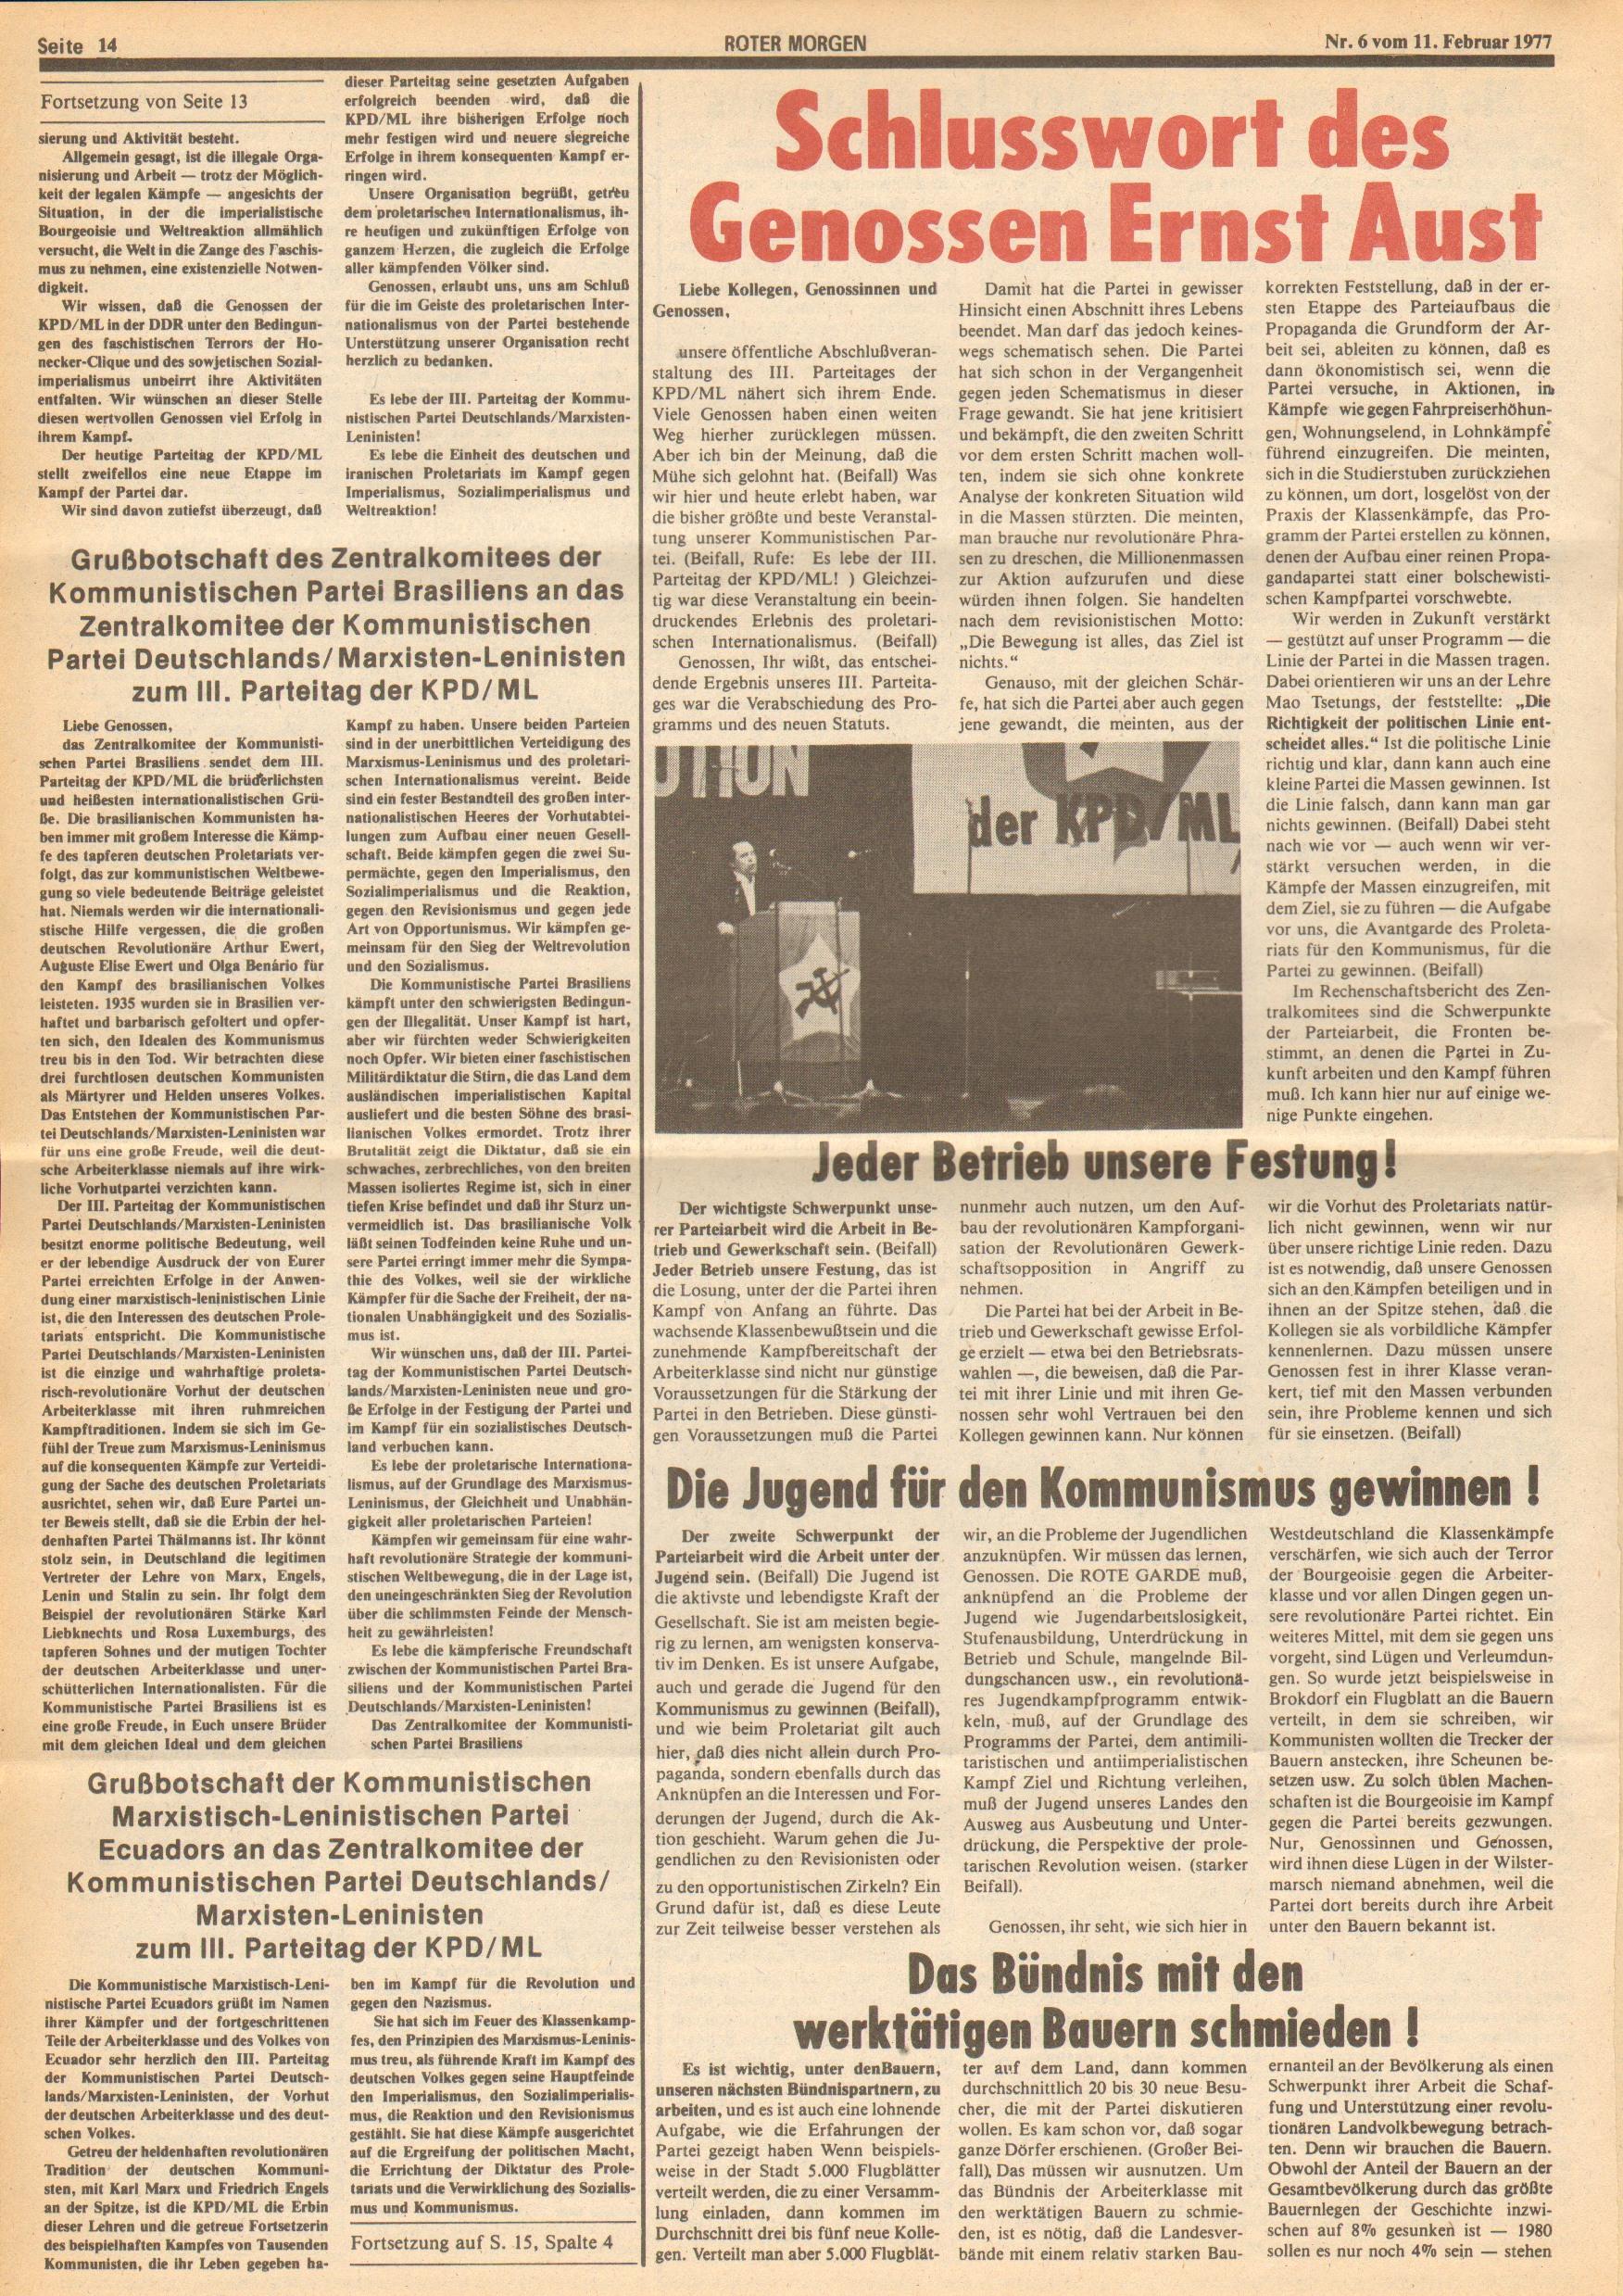 Roter Morgen, 11. Jg., 11. Februar 1977, Nr. 6, Seite 14